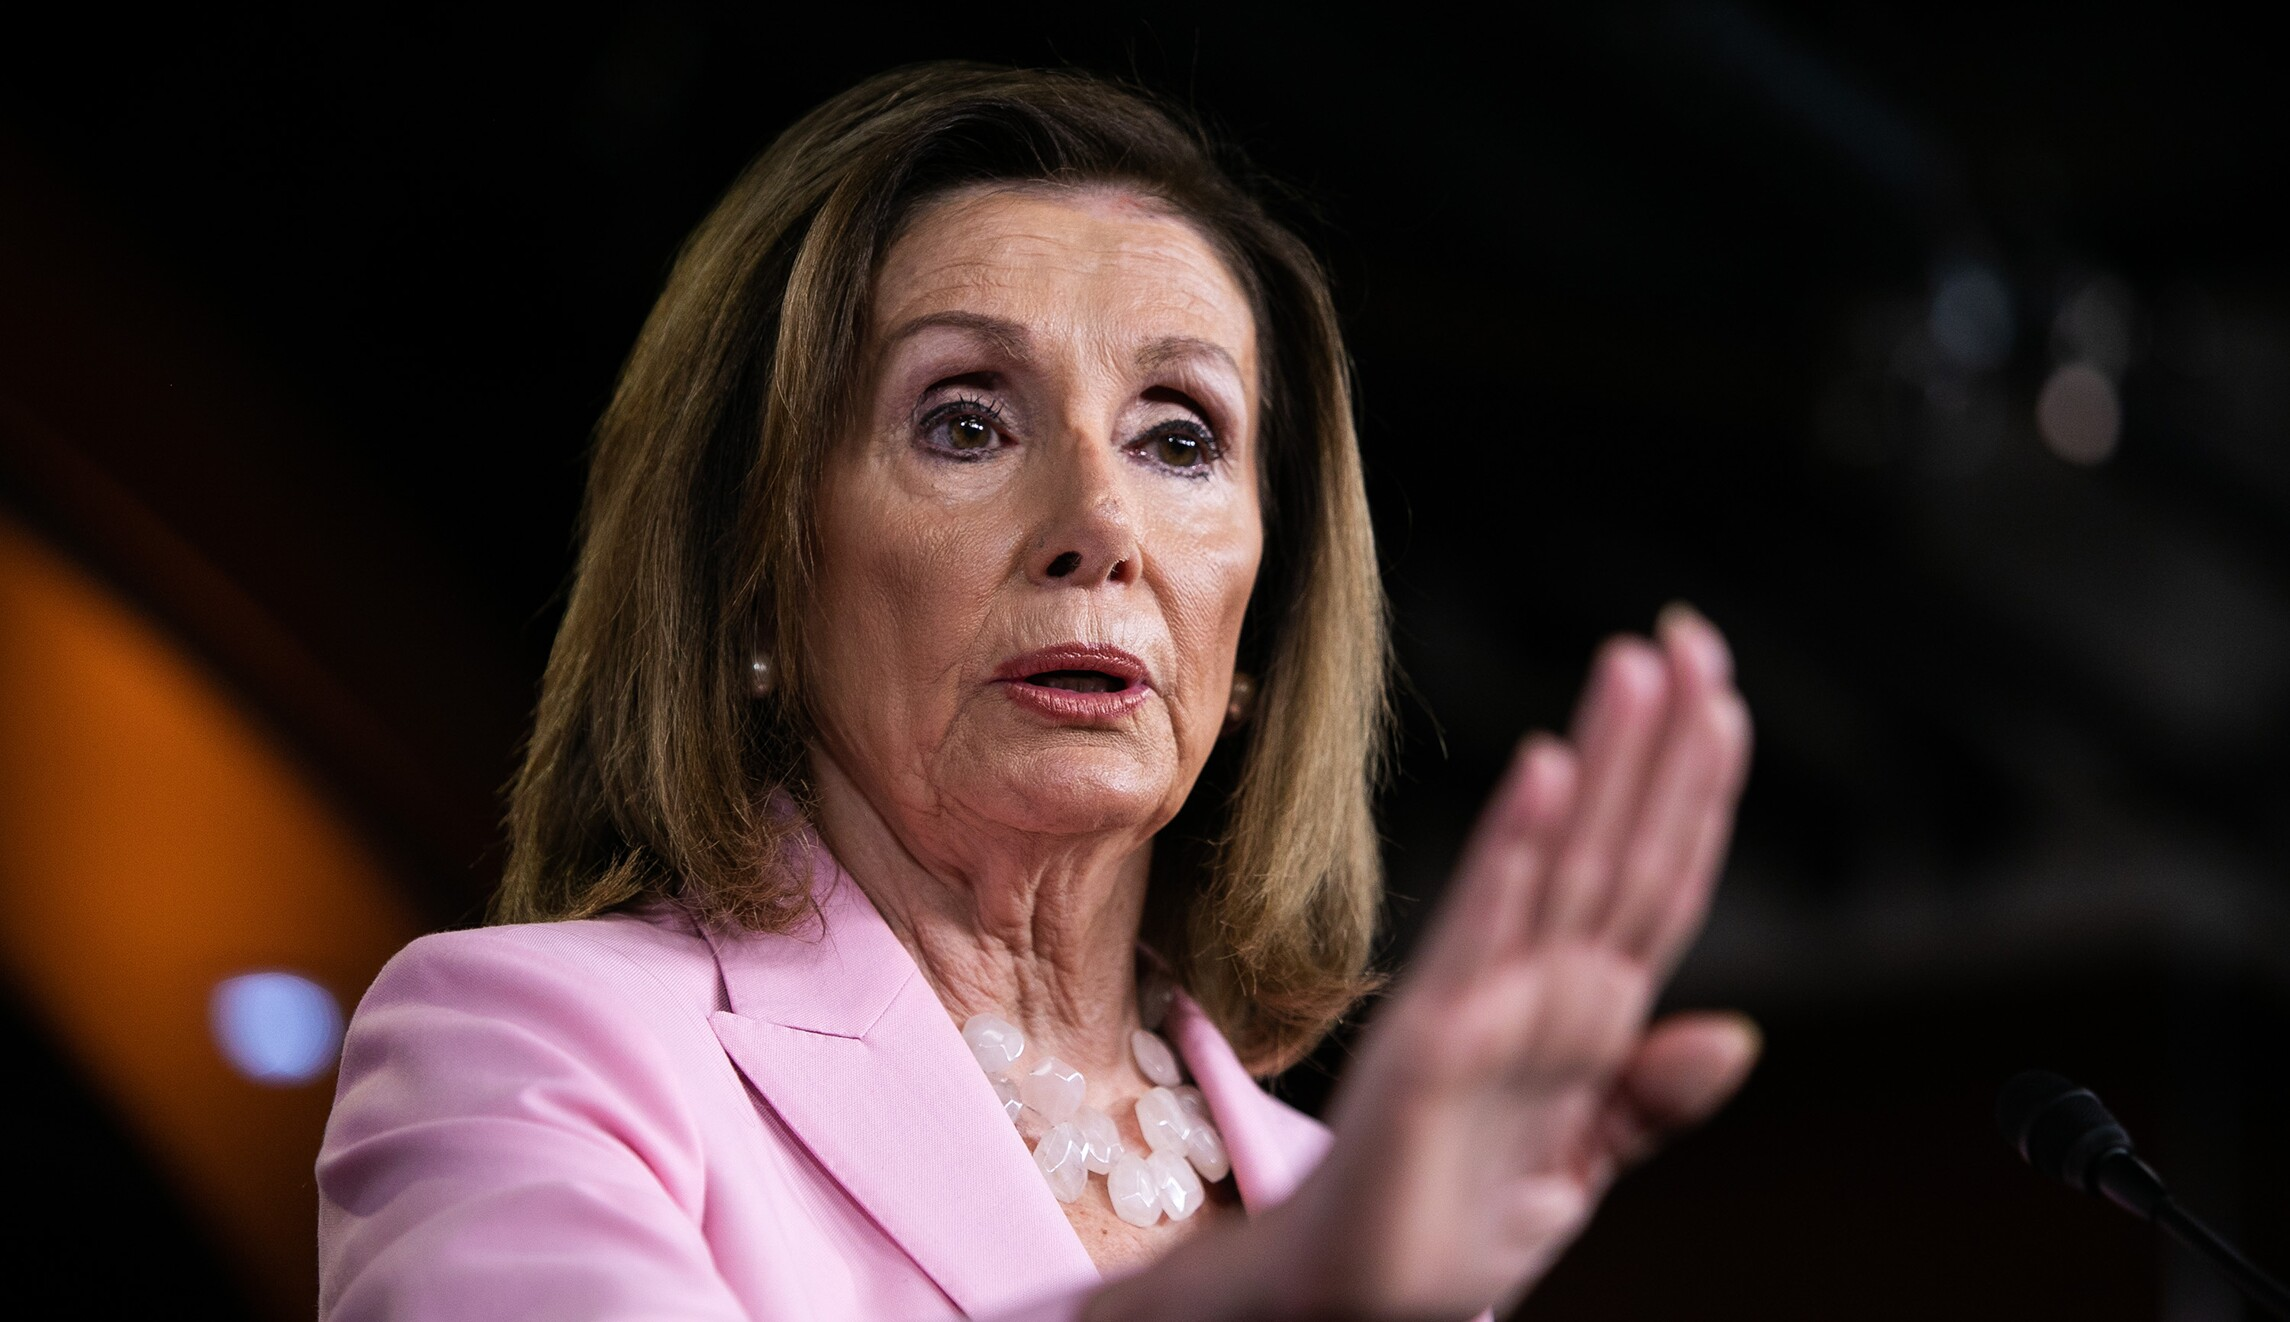 Pelosi running again, 80 on Election Day, oldest speaker ever